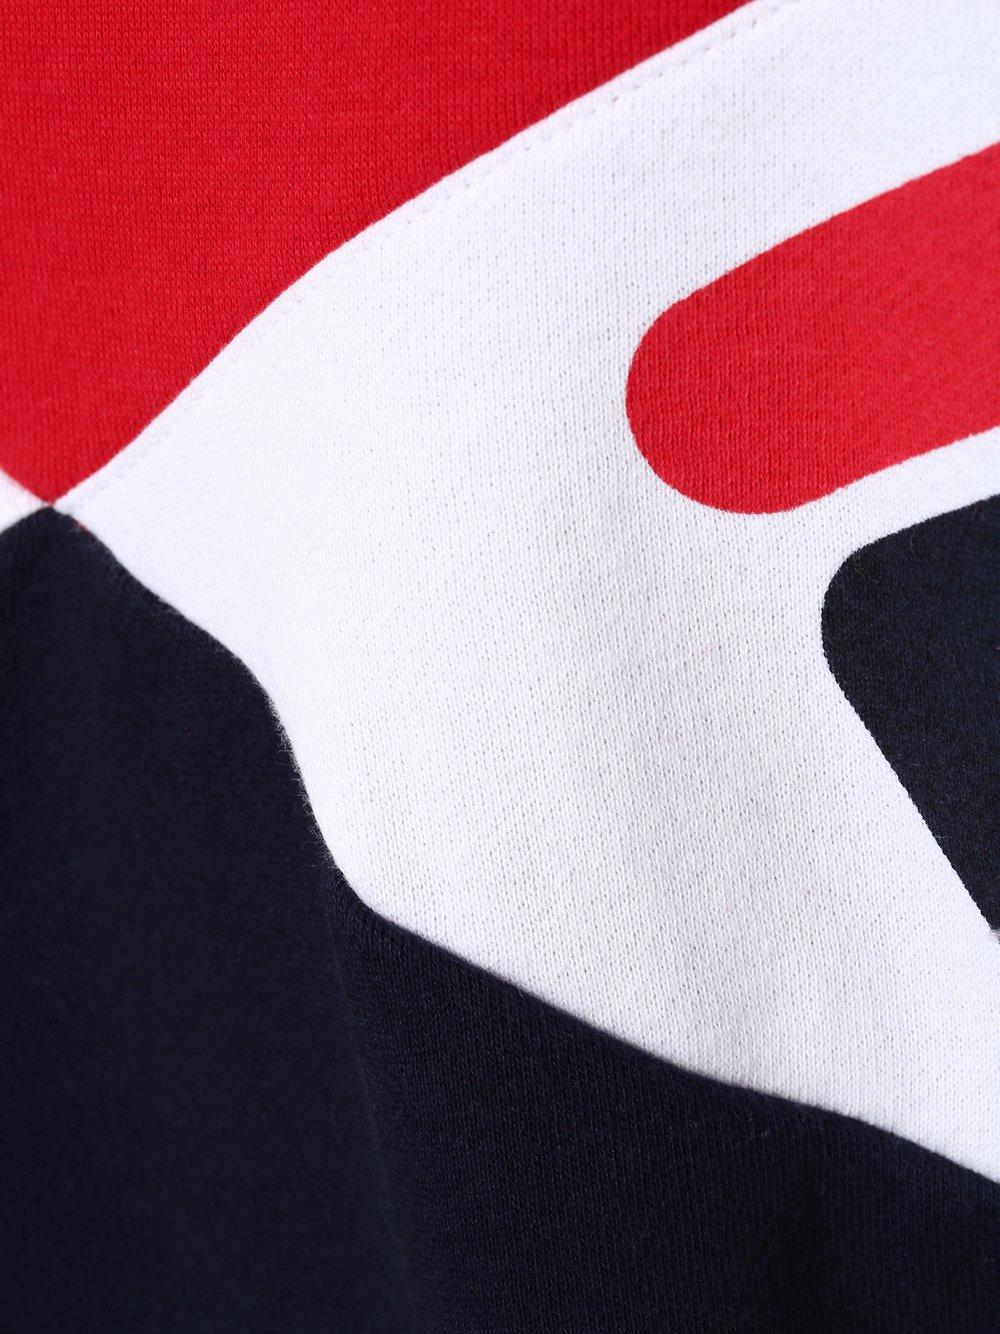 FILA Damen Sweatshirt Lidia online kaufen   PEEK UND